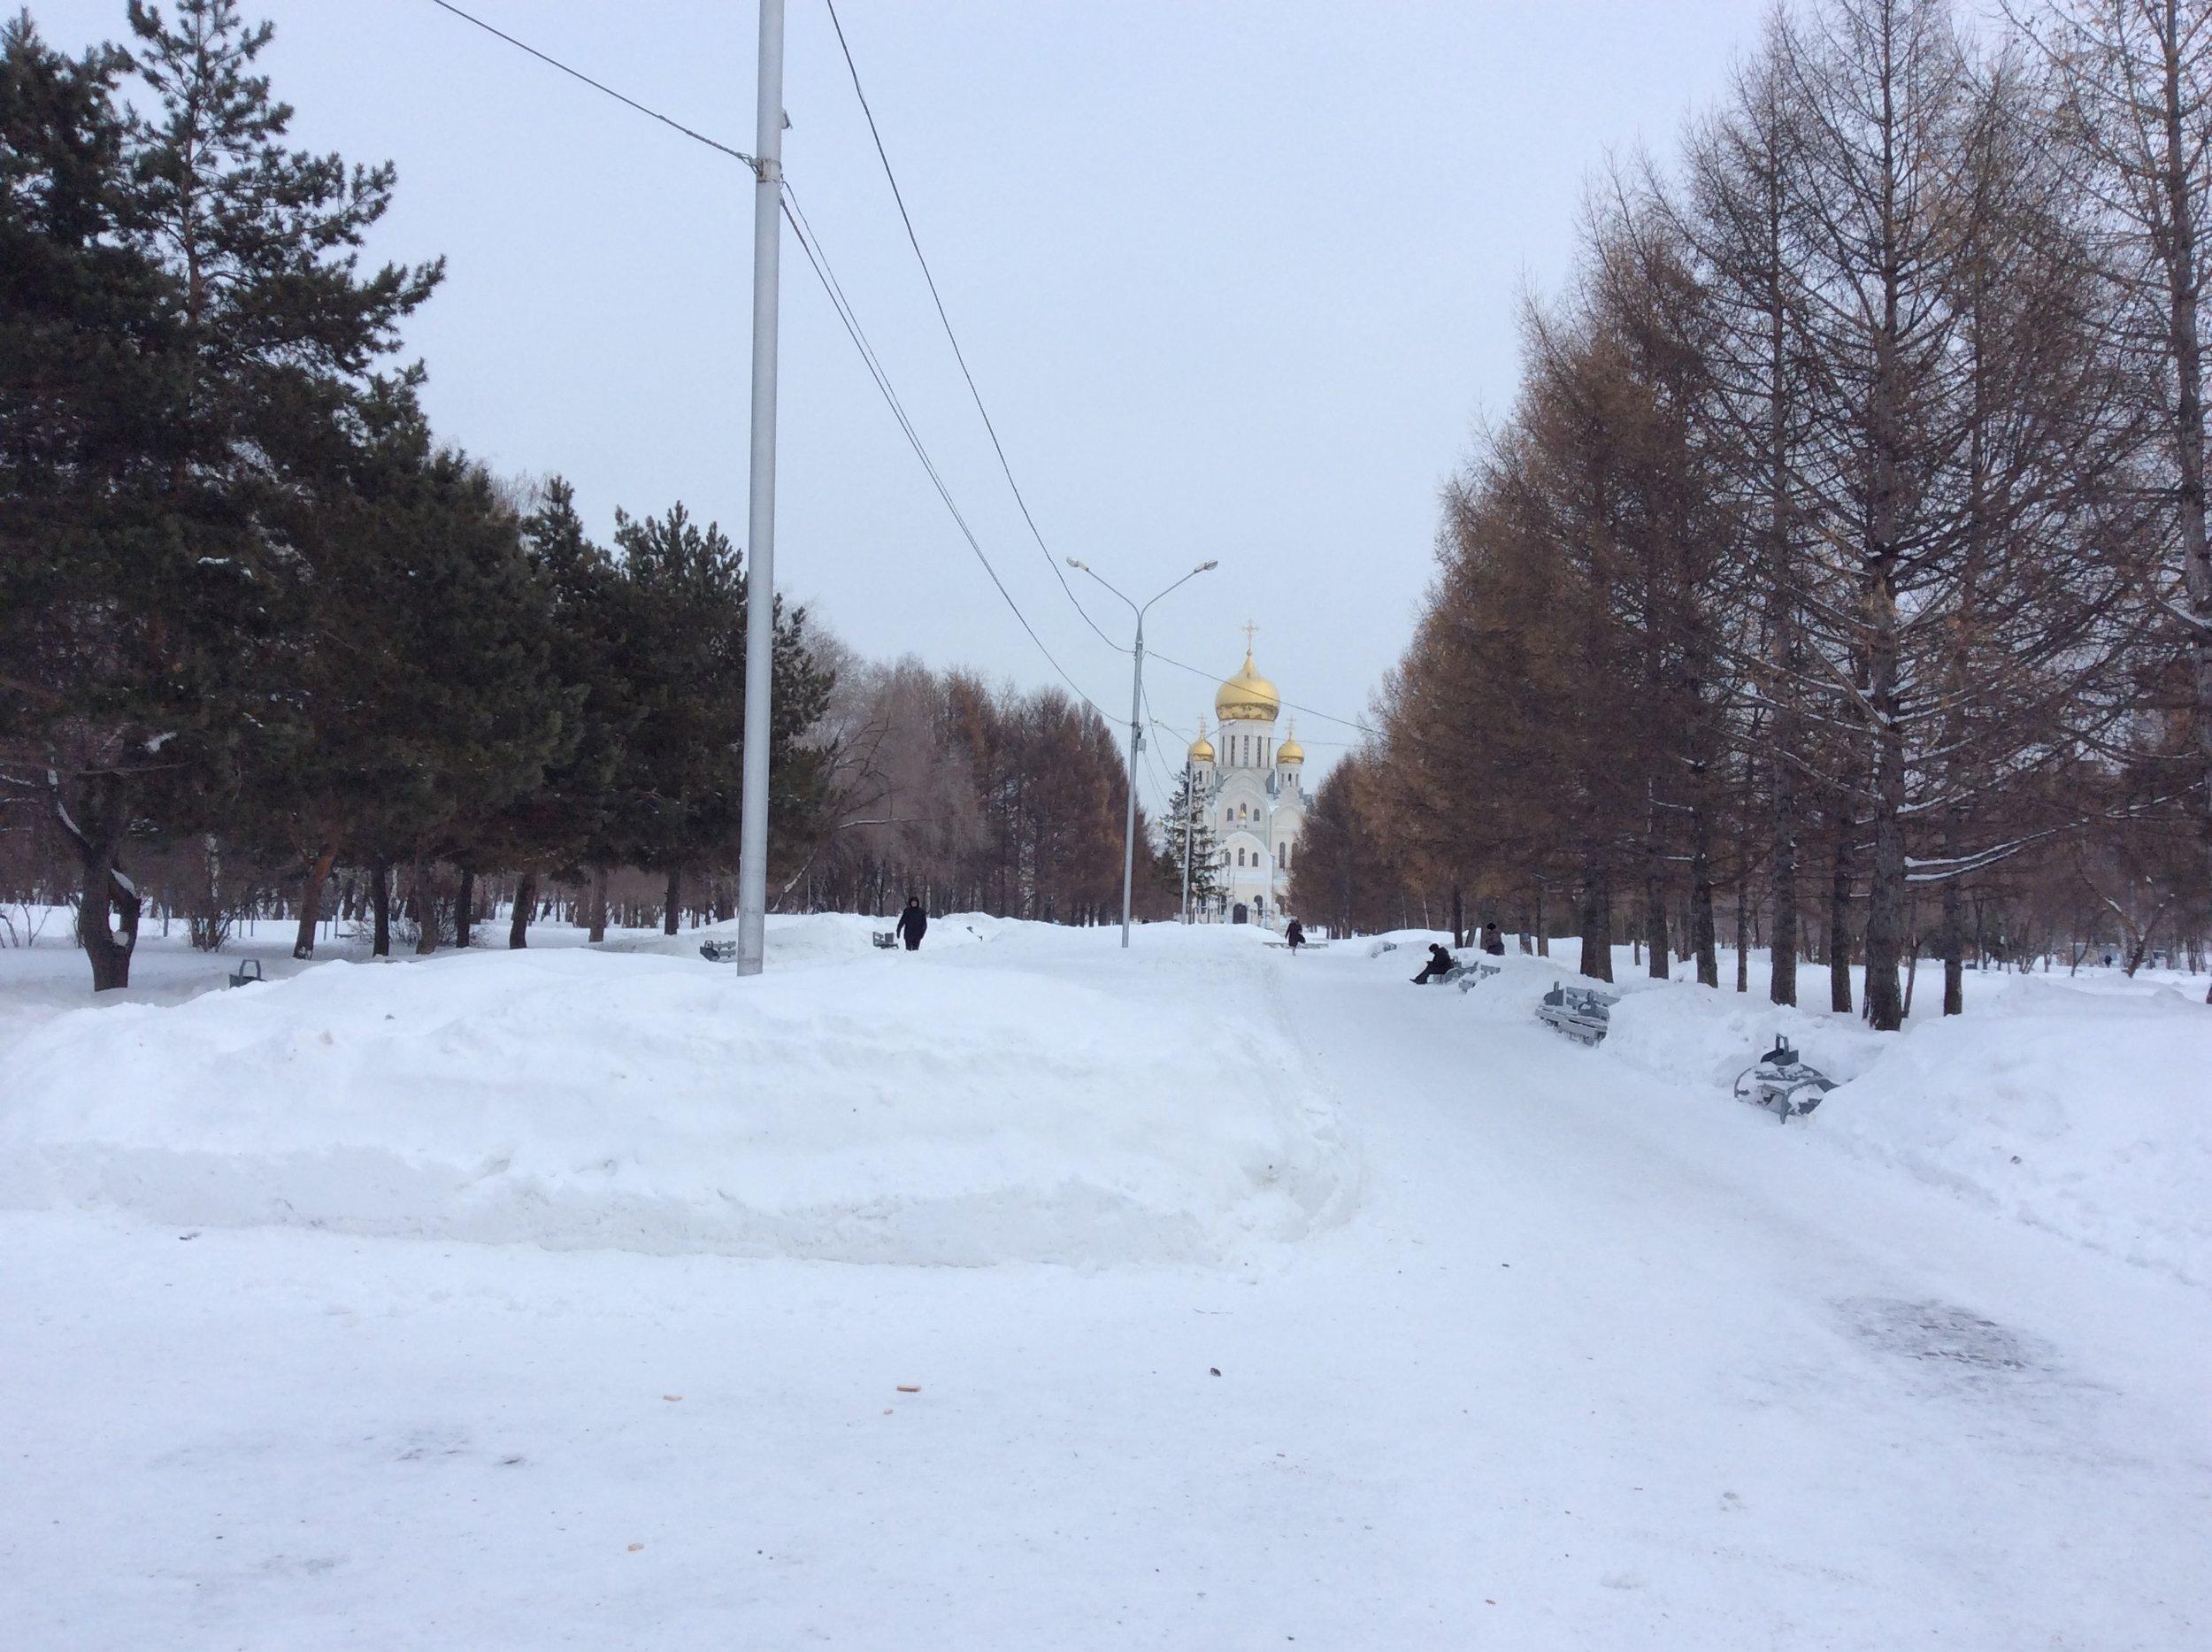 Snow: Jan. 12, 2017, Novosibirsk, Siberia.